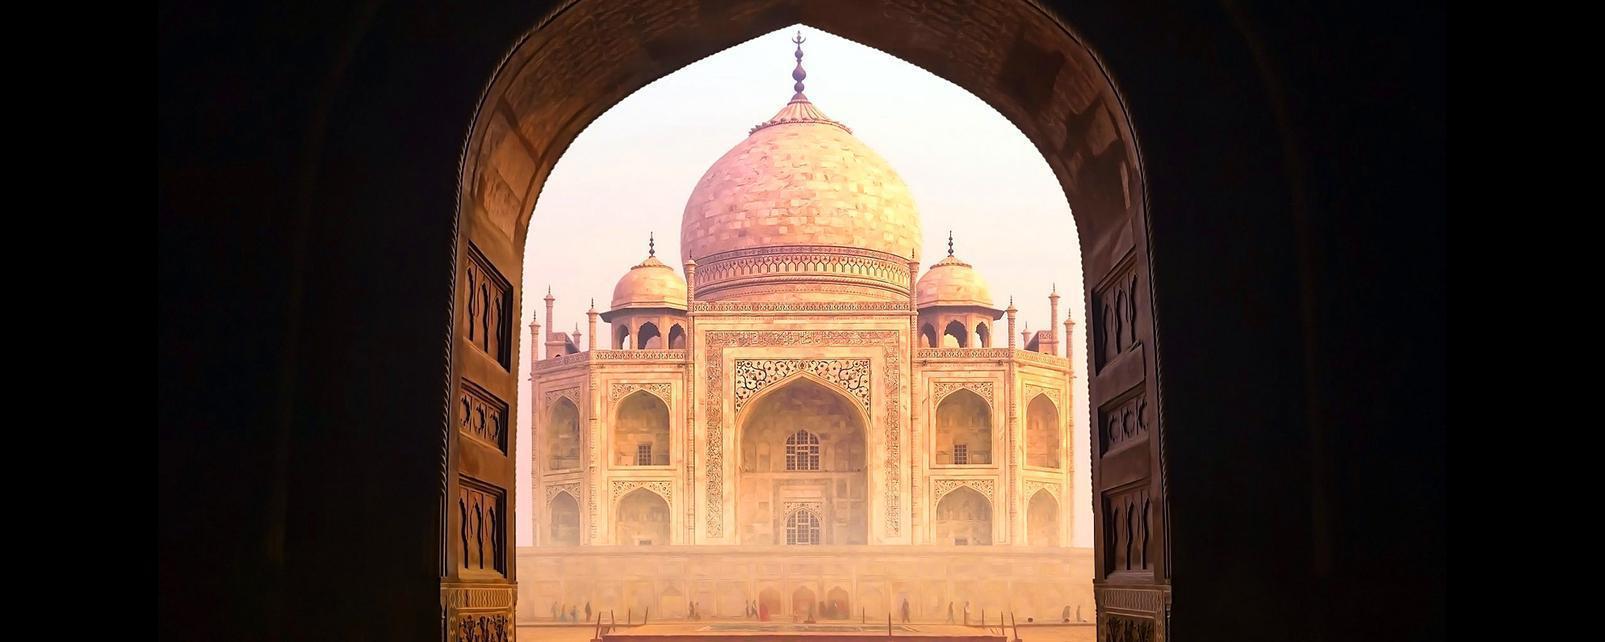 Asie, Inde, Agra, Taj Mahal, architecture, palais,